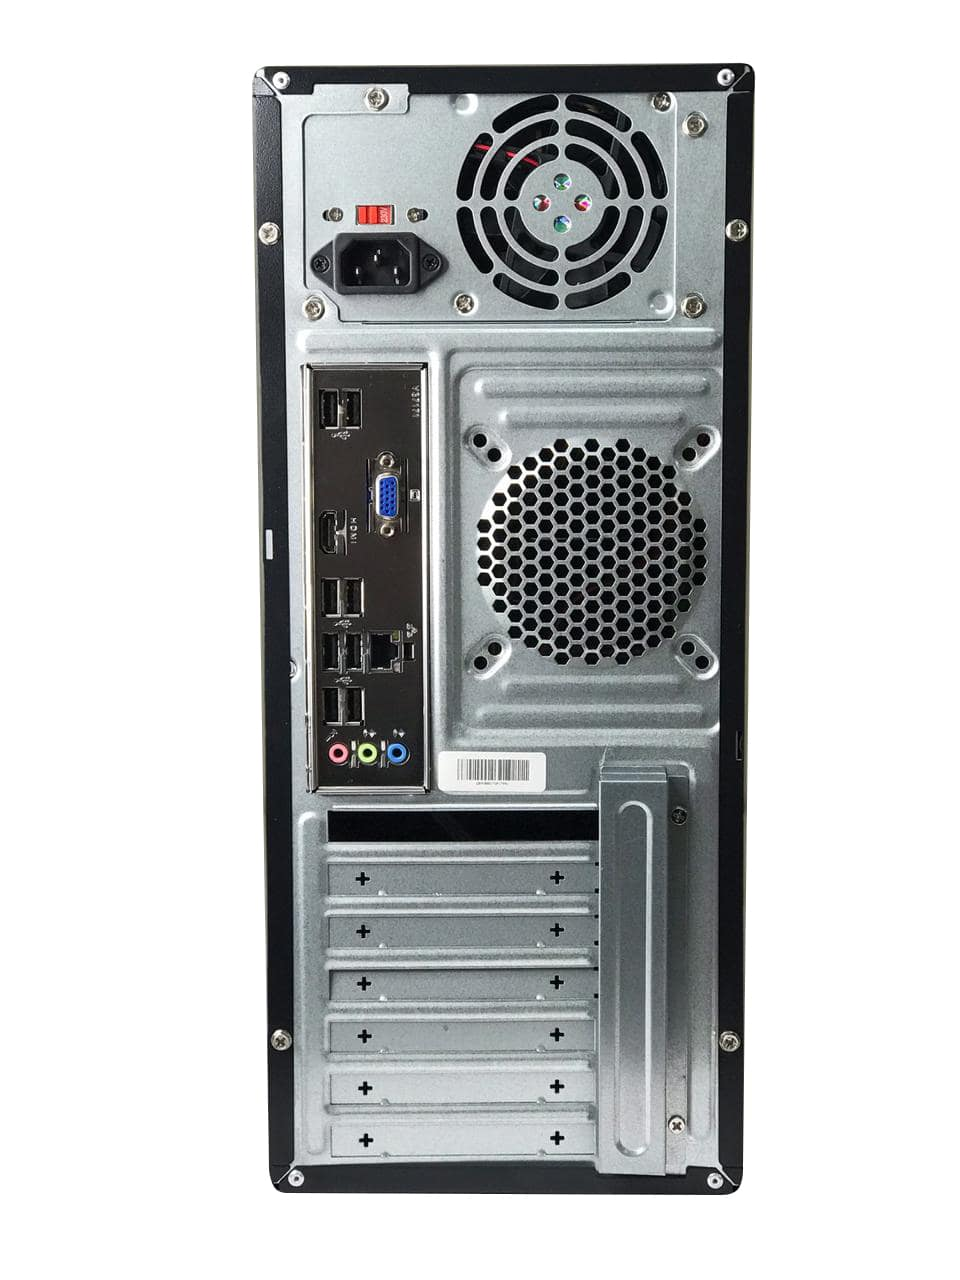 Computador Completo 4GB Hd 160GB Hdmi Wind7 F-new